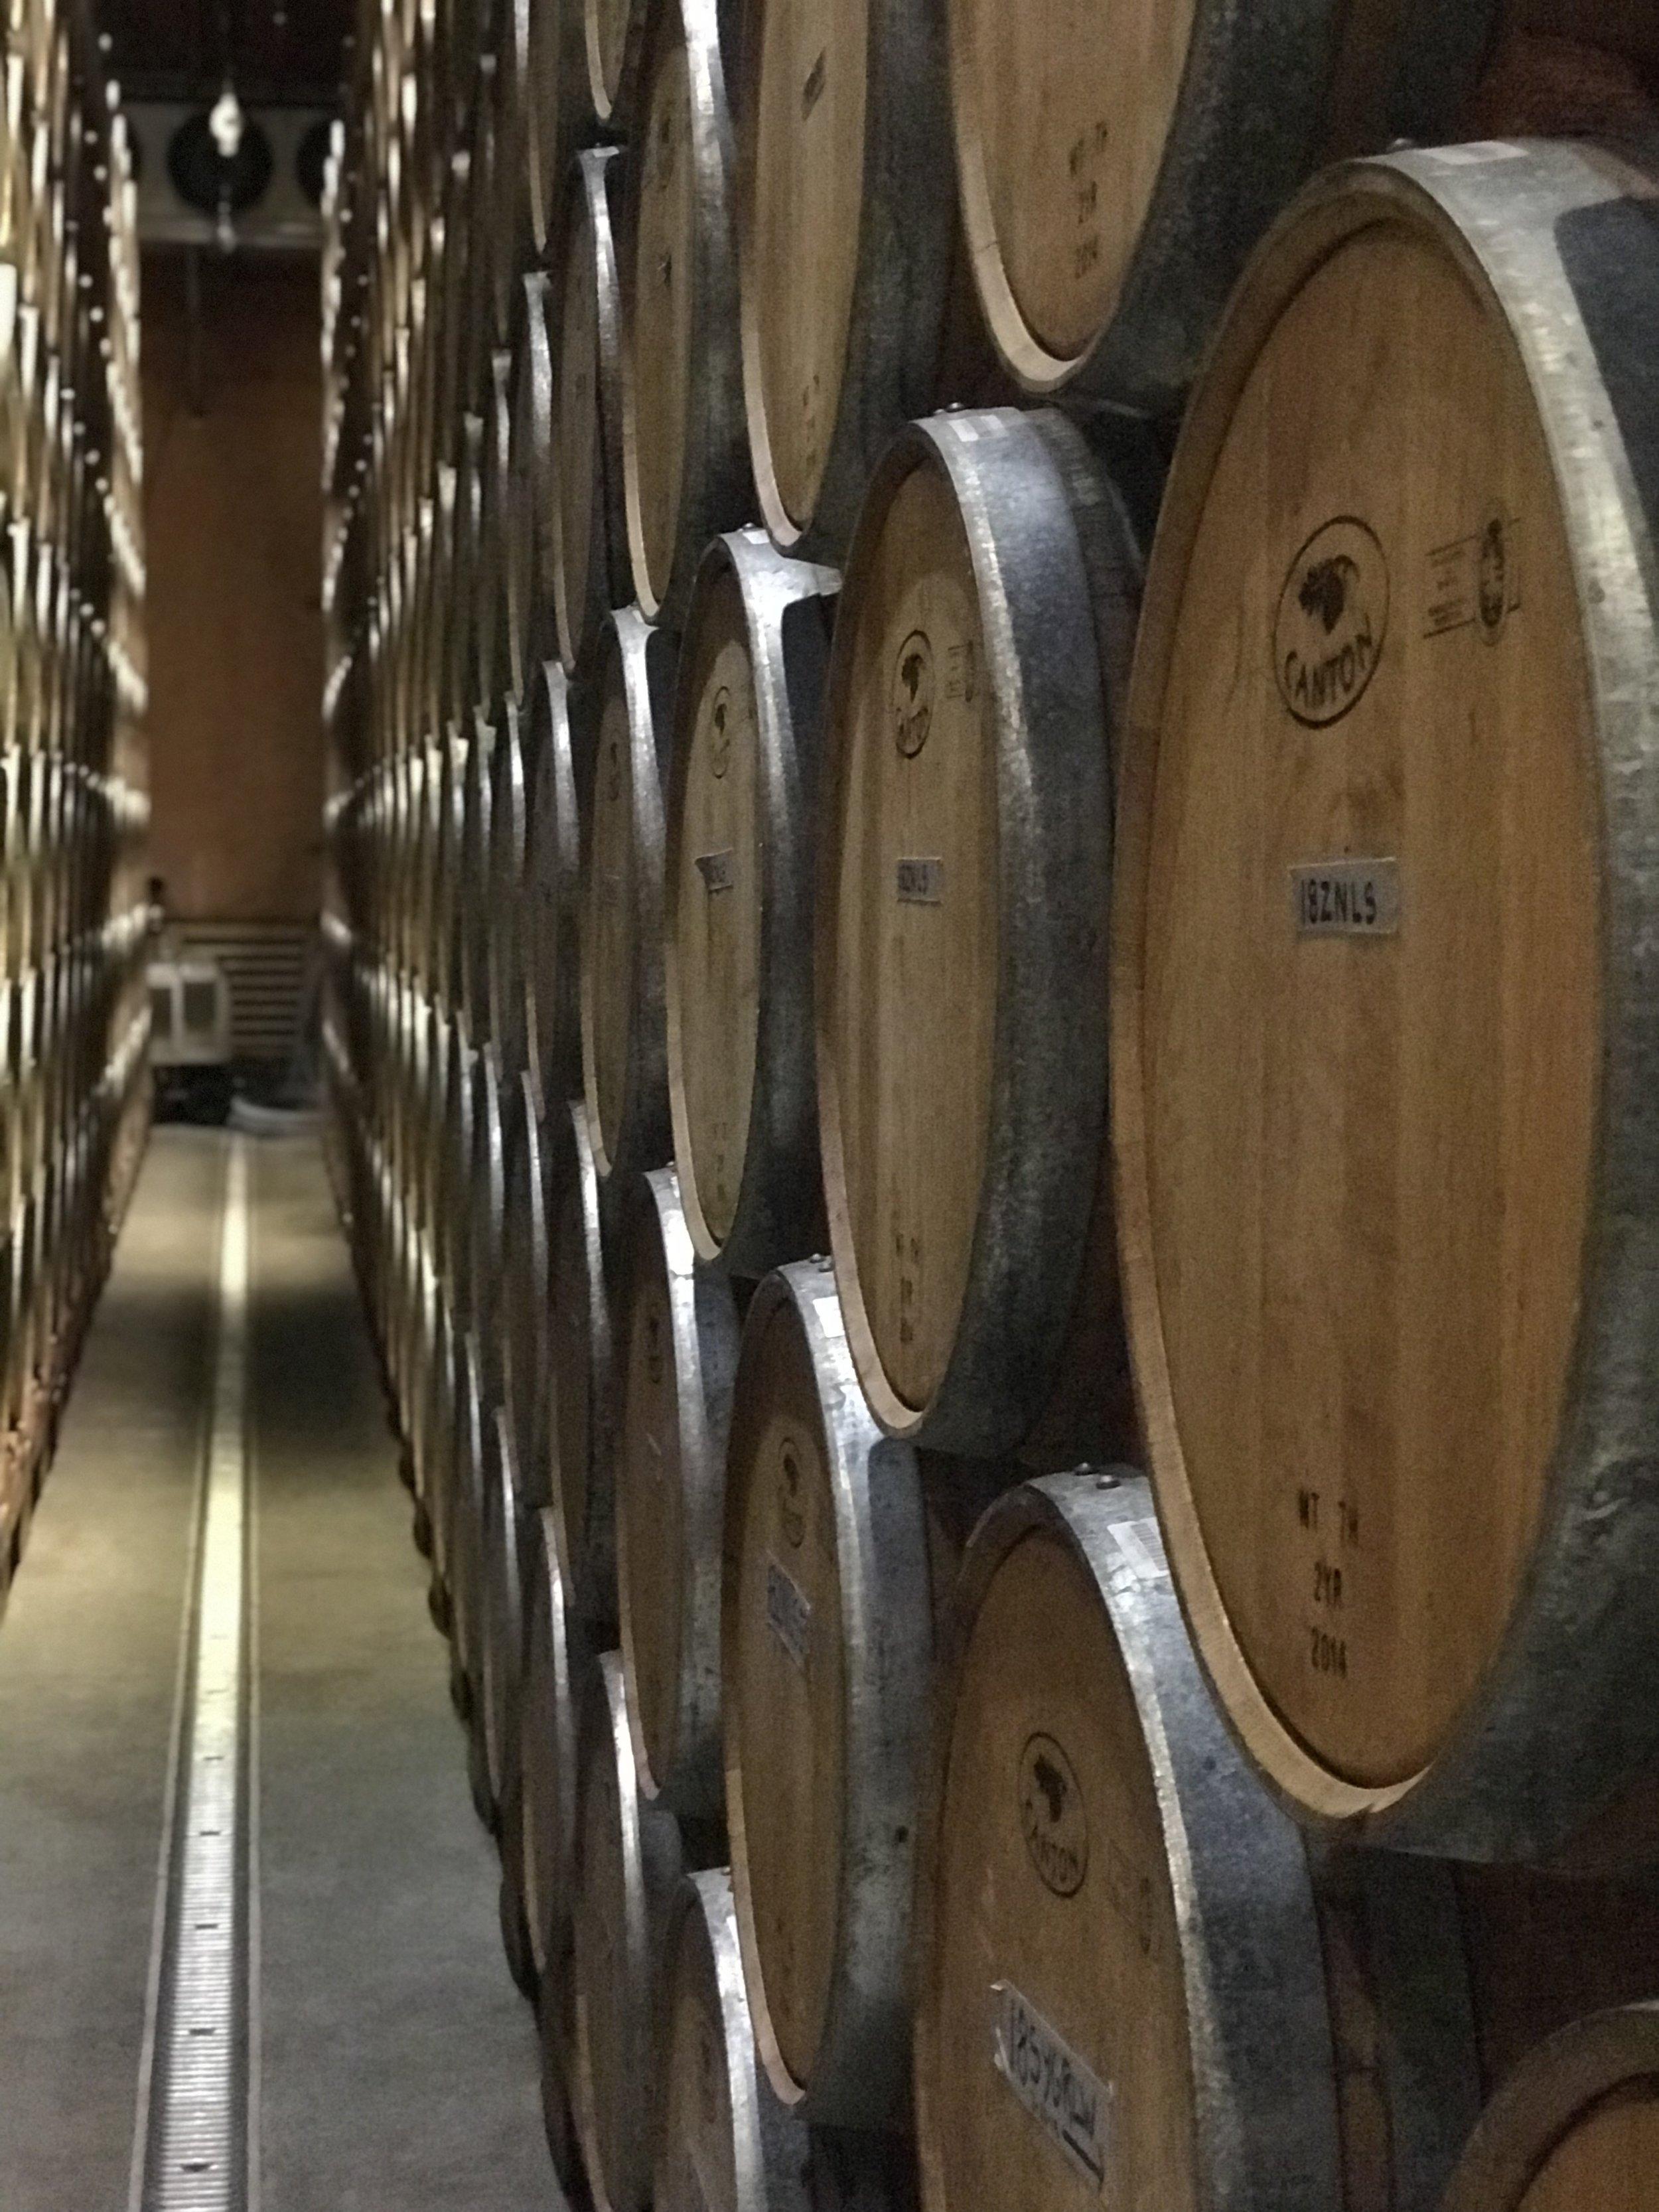 Ridge Vineyards Winery Tour Oak Barrel.jpg